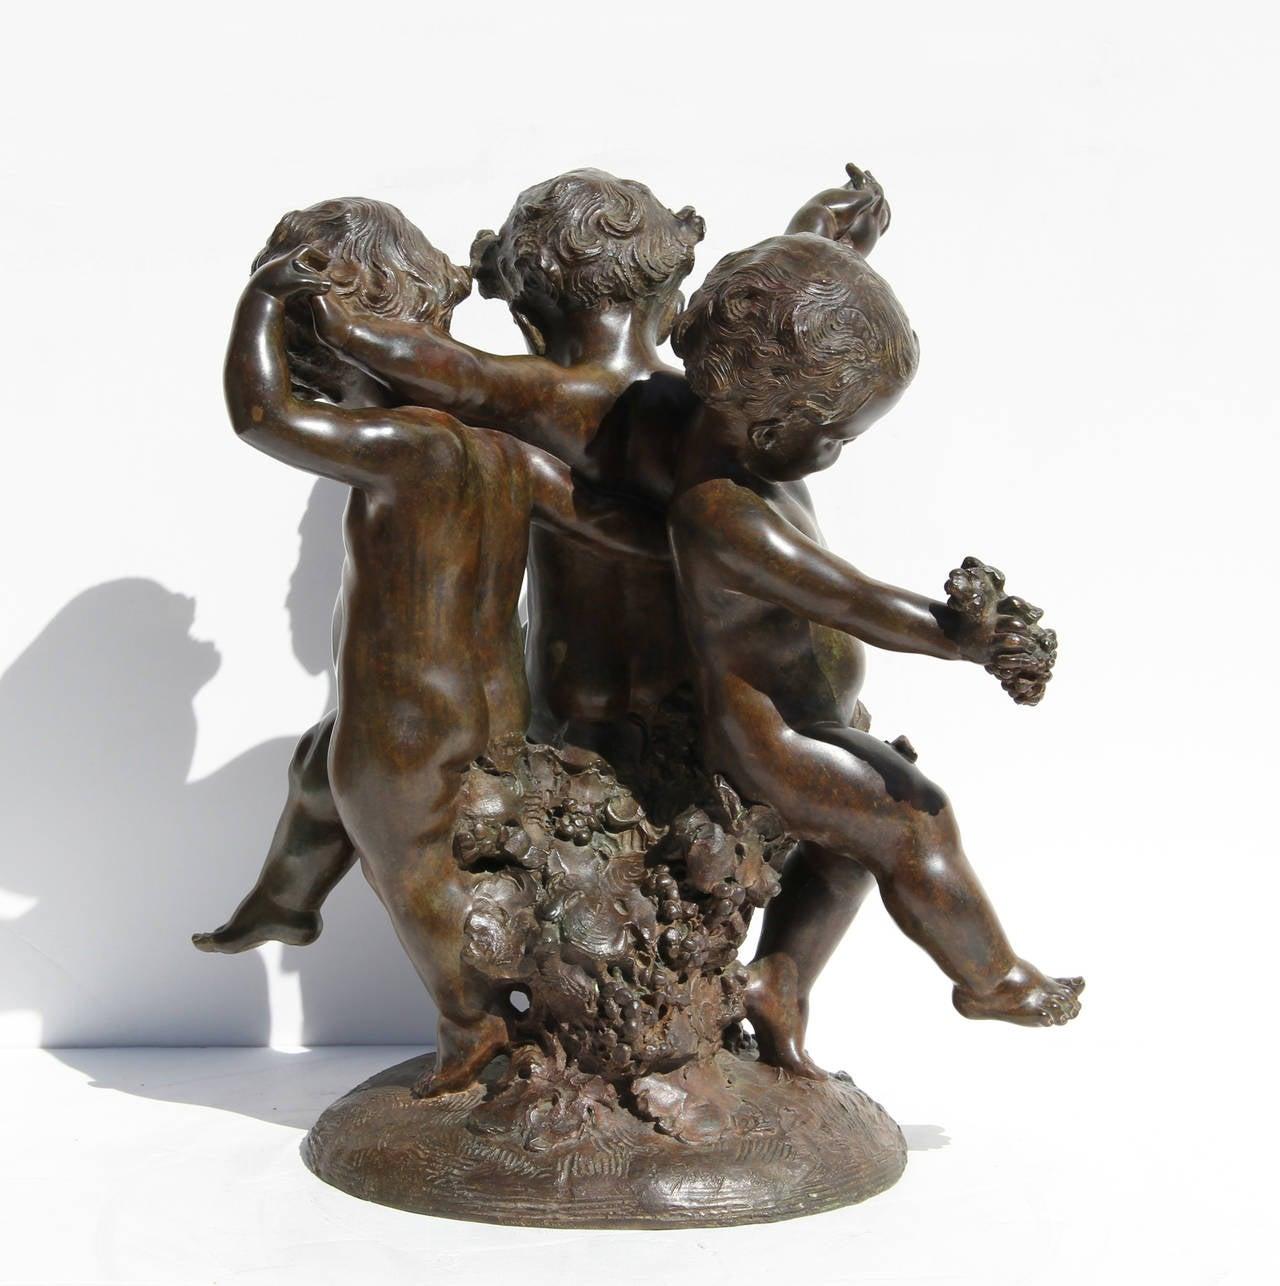 Three Putti - Gold Figurative Sculpture by Affortunato Gory